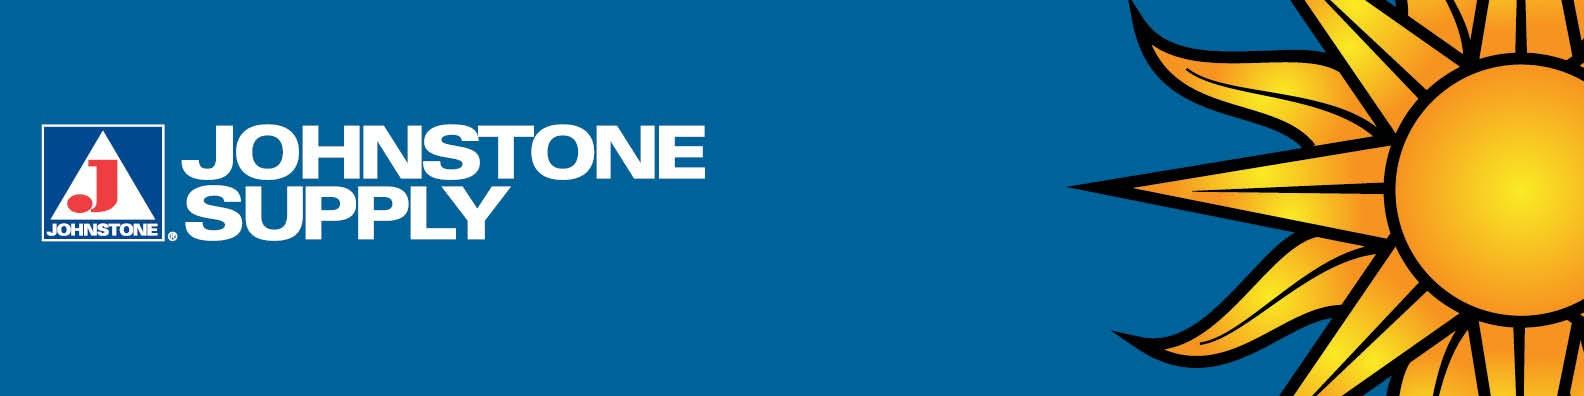 Johnstone Supply | LinkedIn